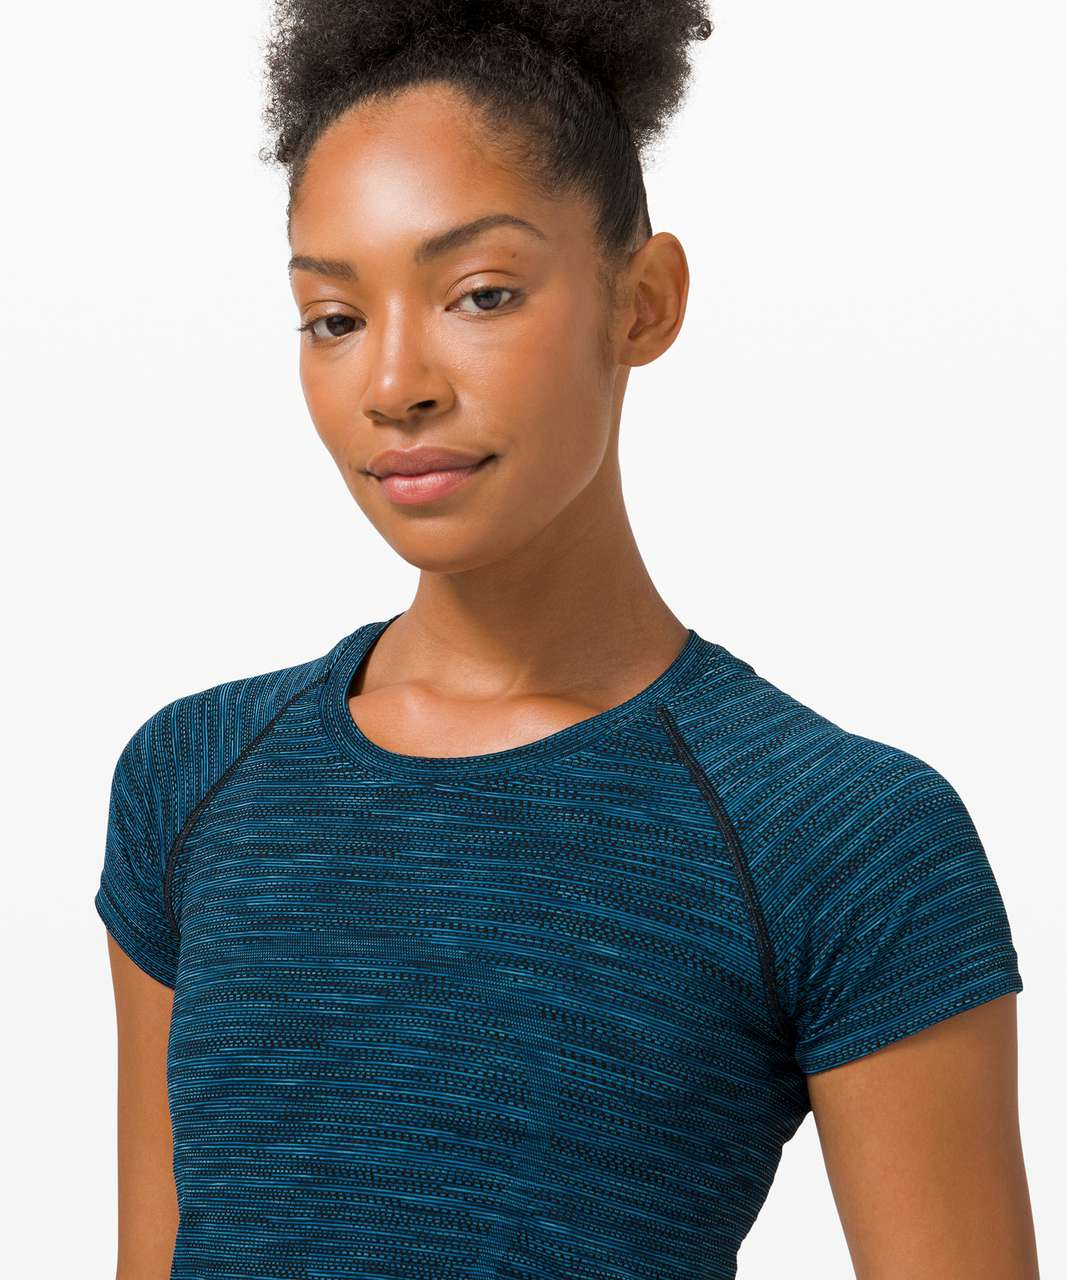 Lululemon Swiftly Tech Short Sleeve 2.0 - Prism Stripe Turquoise Tide Multi